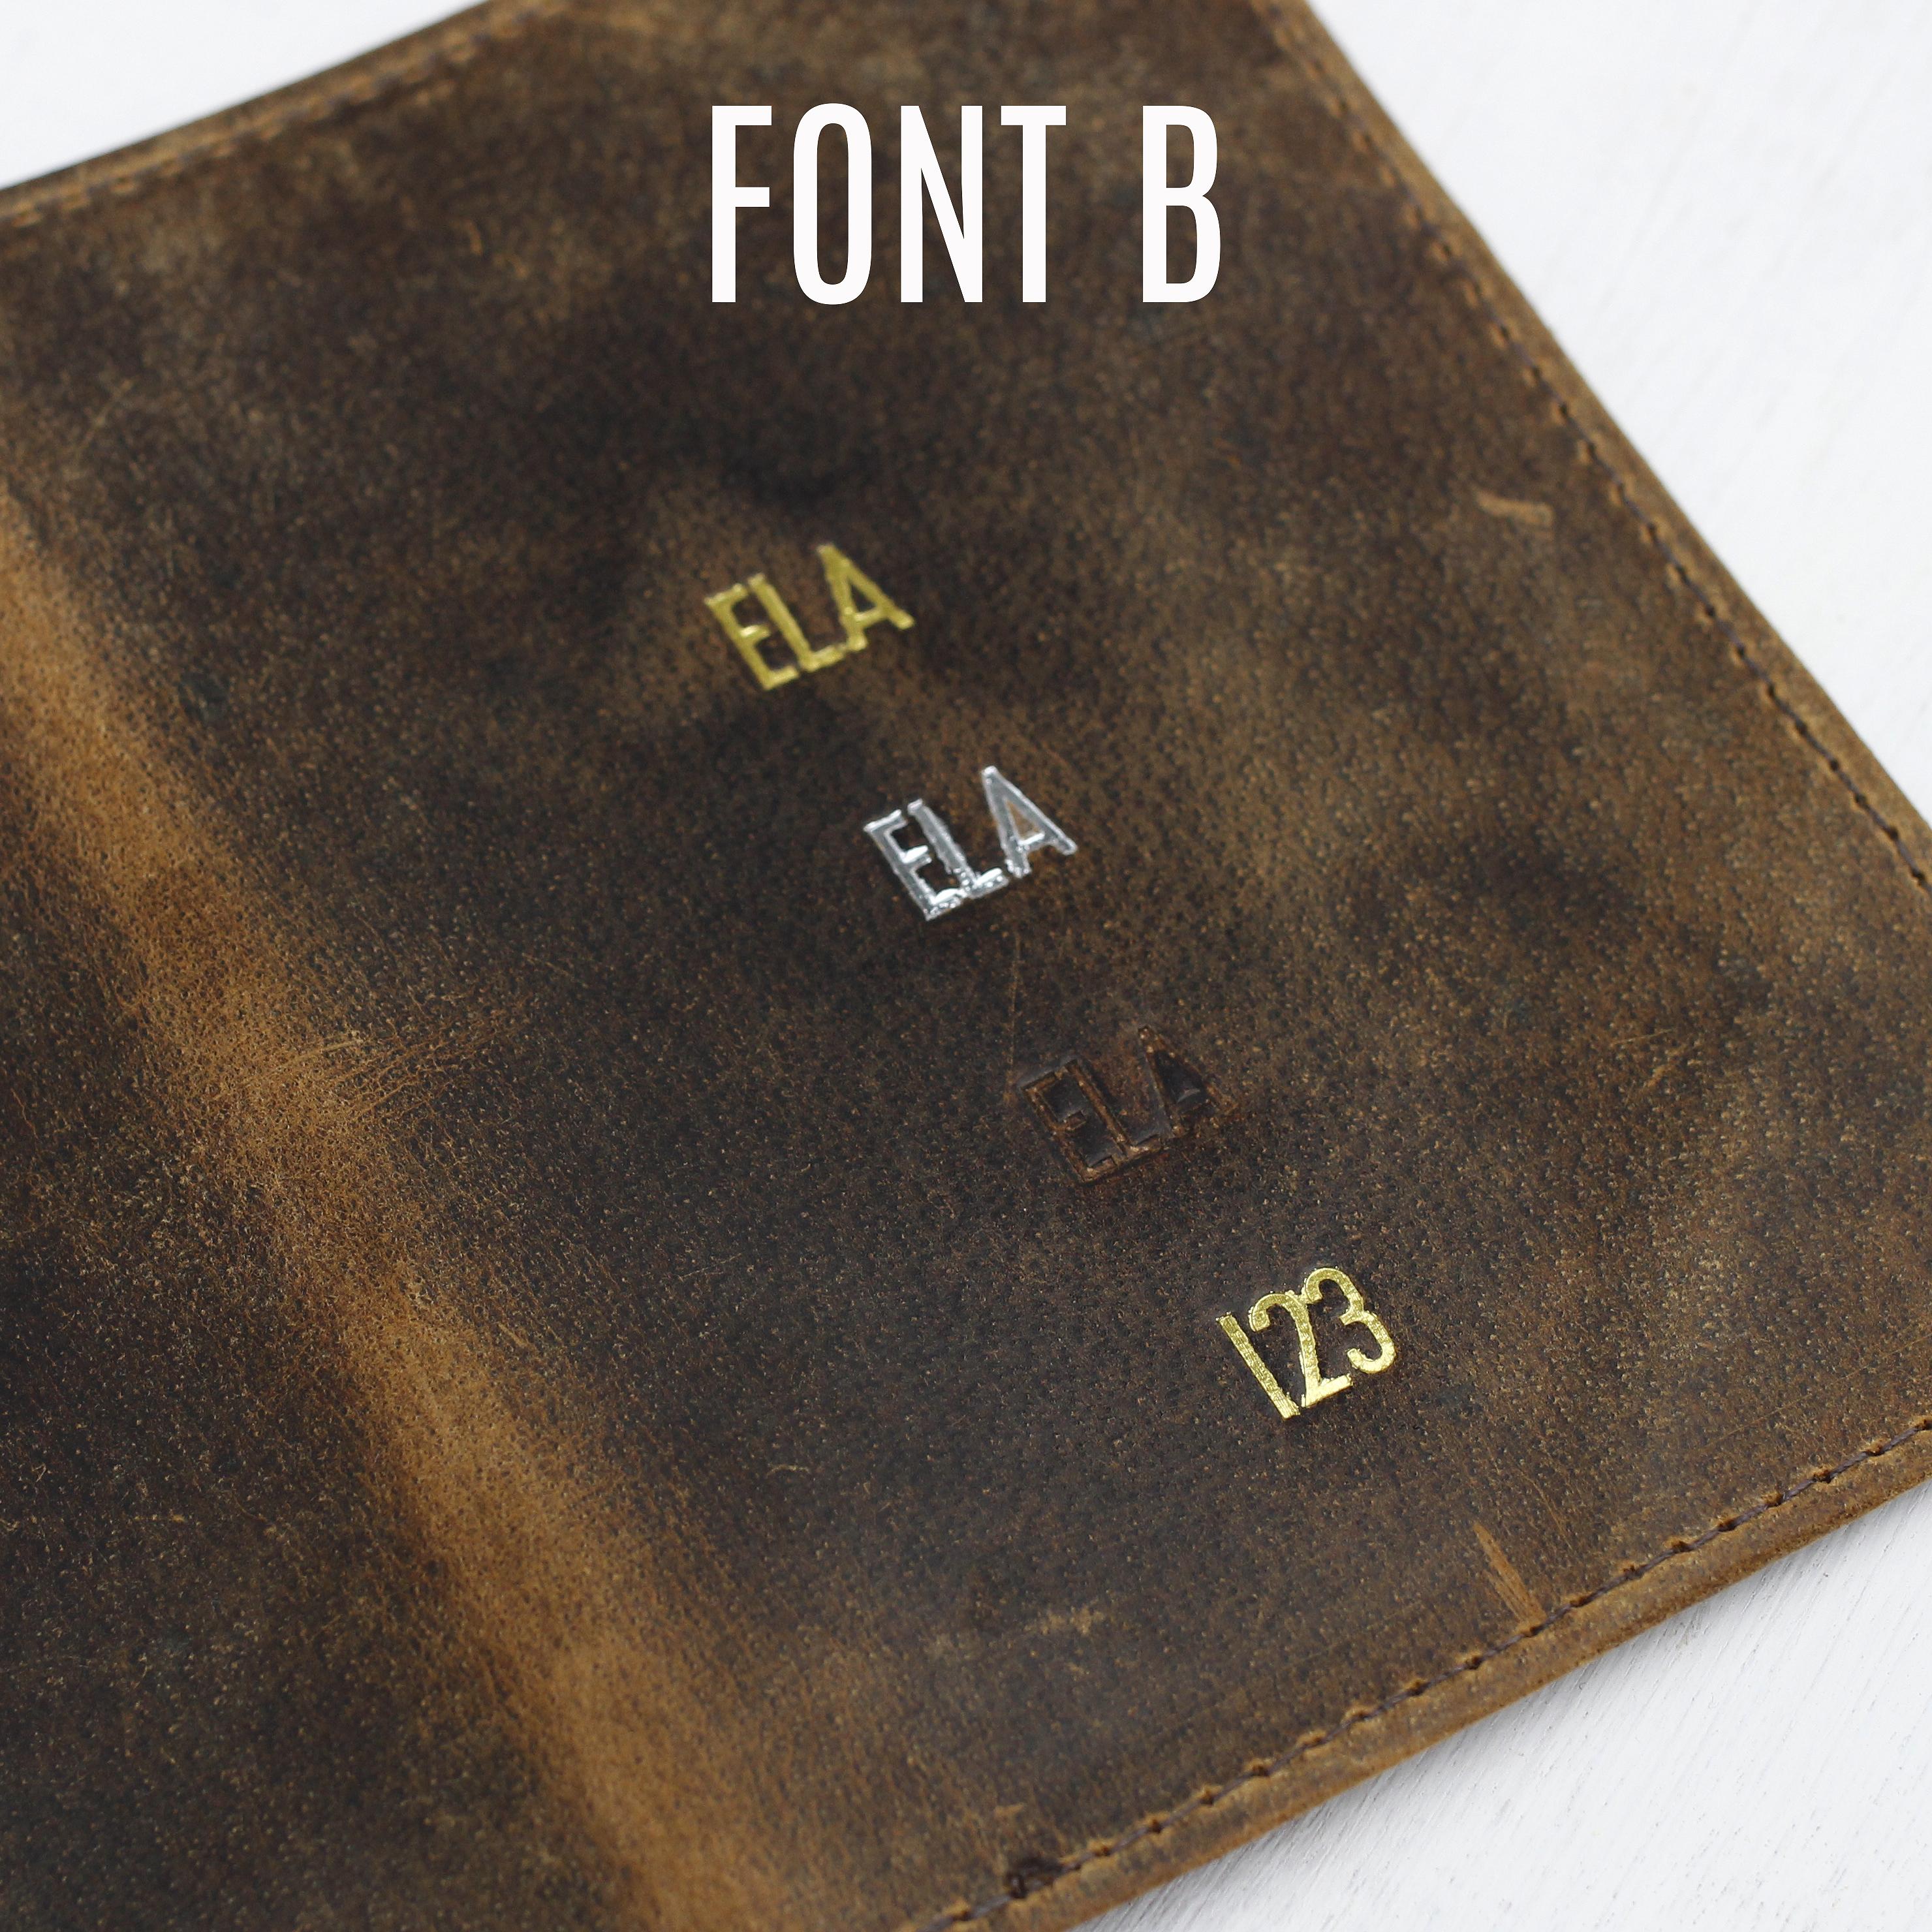 Embossing FONT B